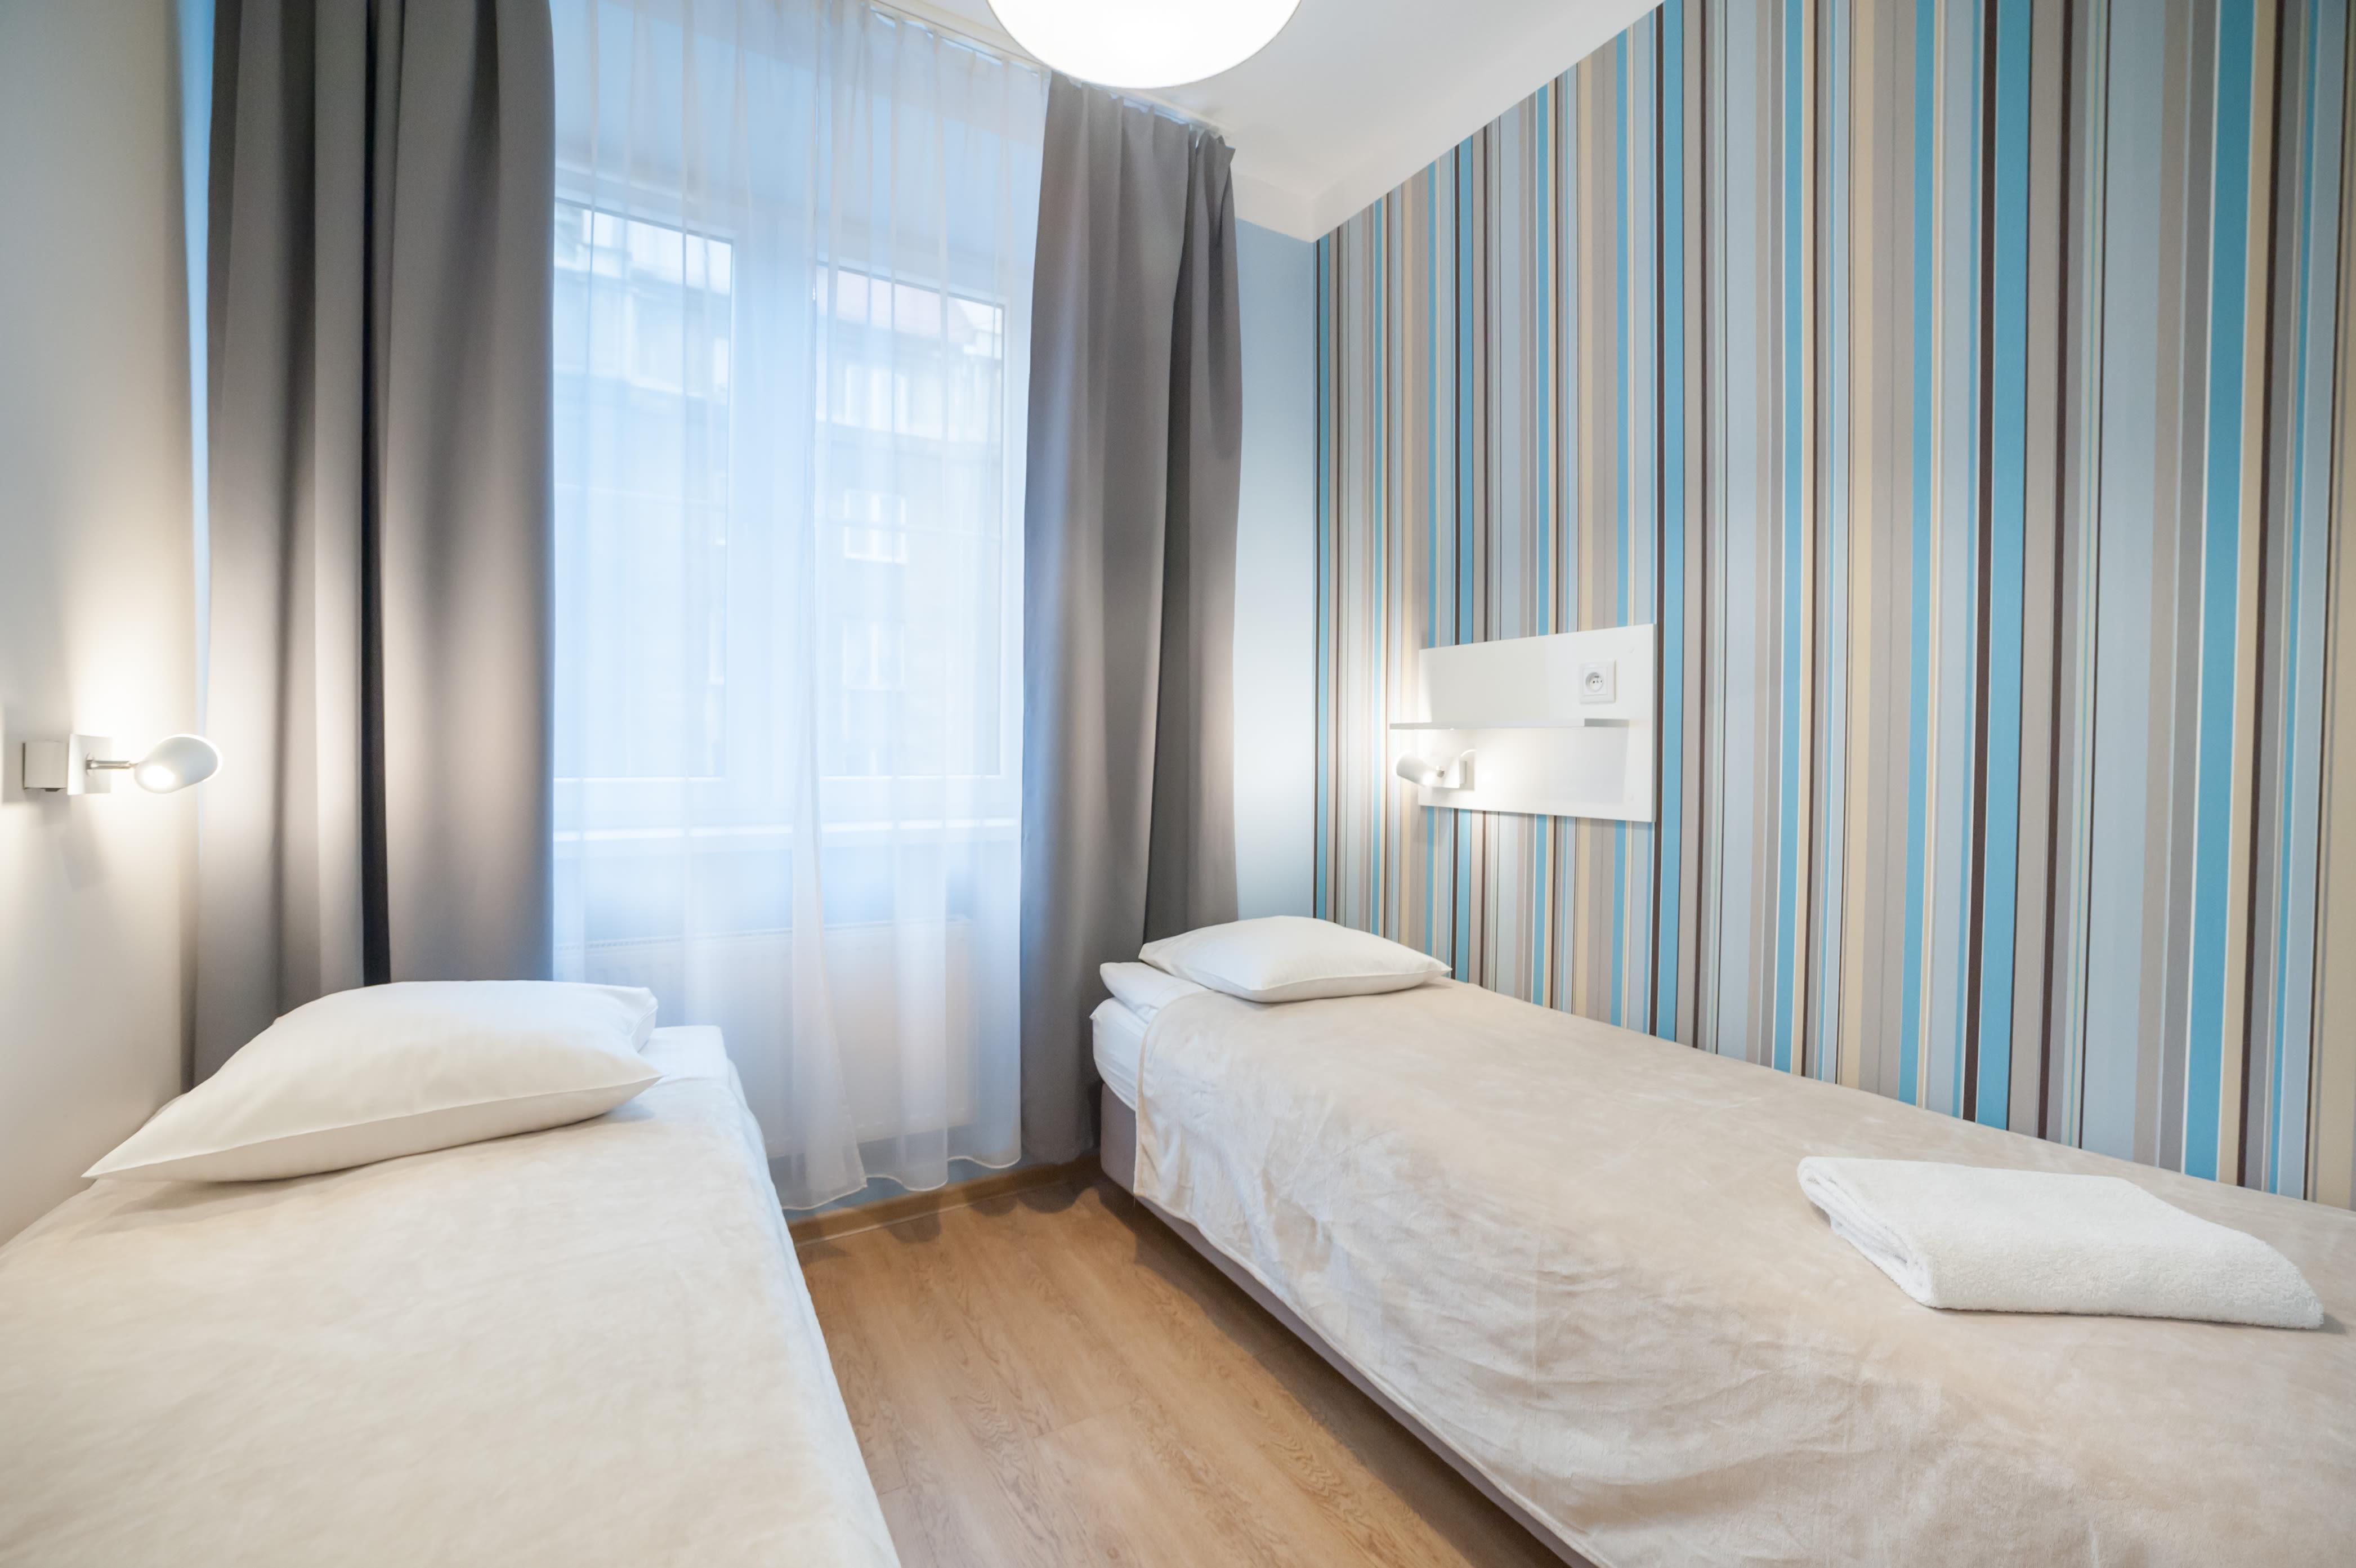 HOSTEL - Premium Hostel